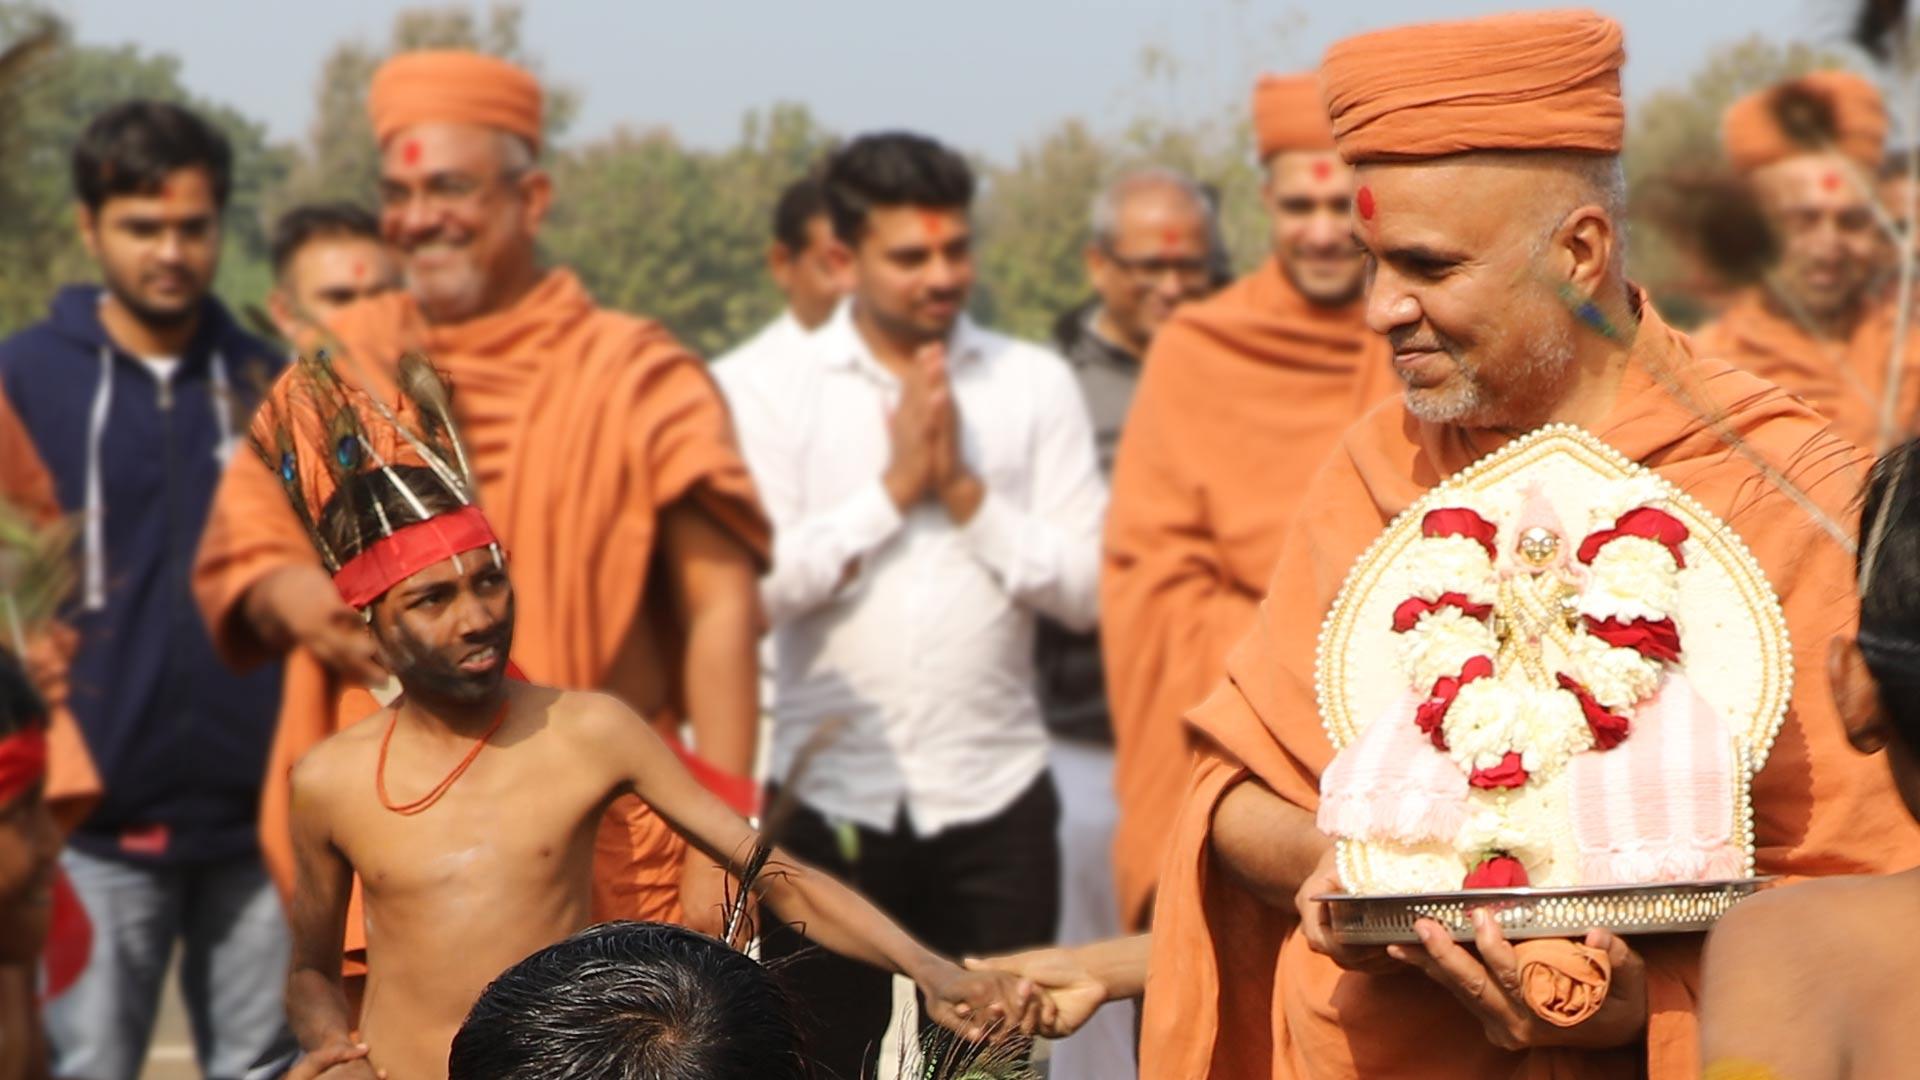 HDH Swamishri Vicharan - January 2020 (1st January to 15th January)